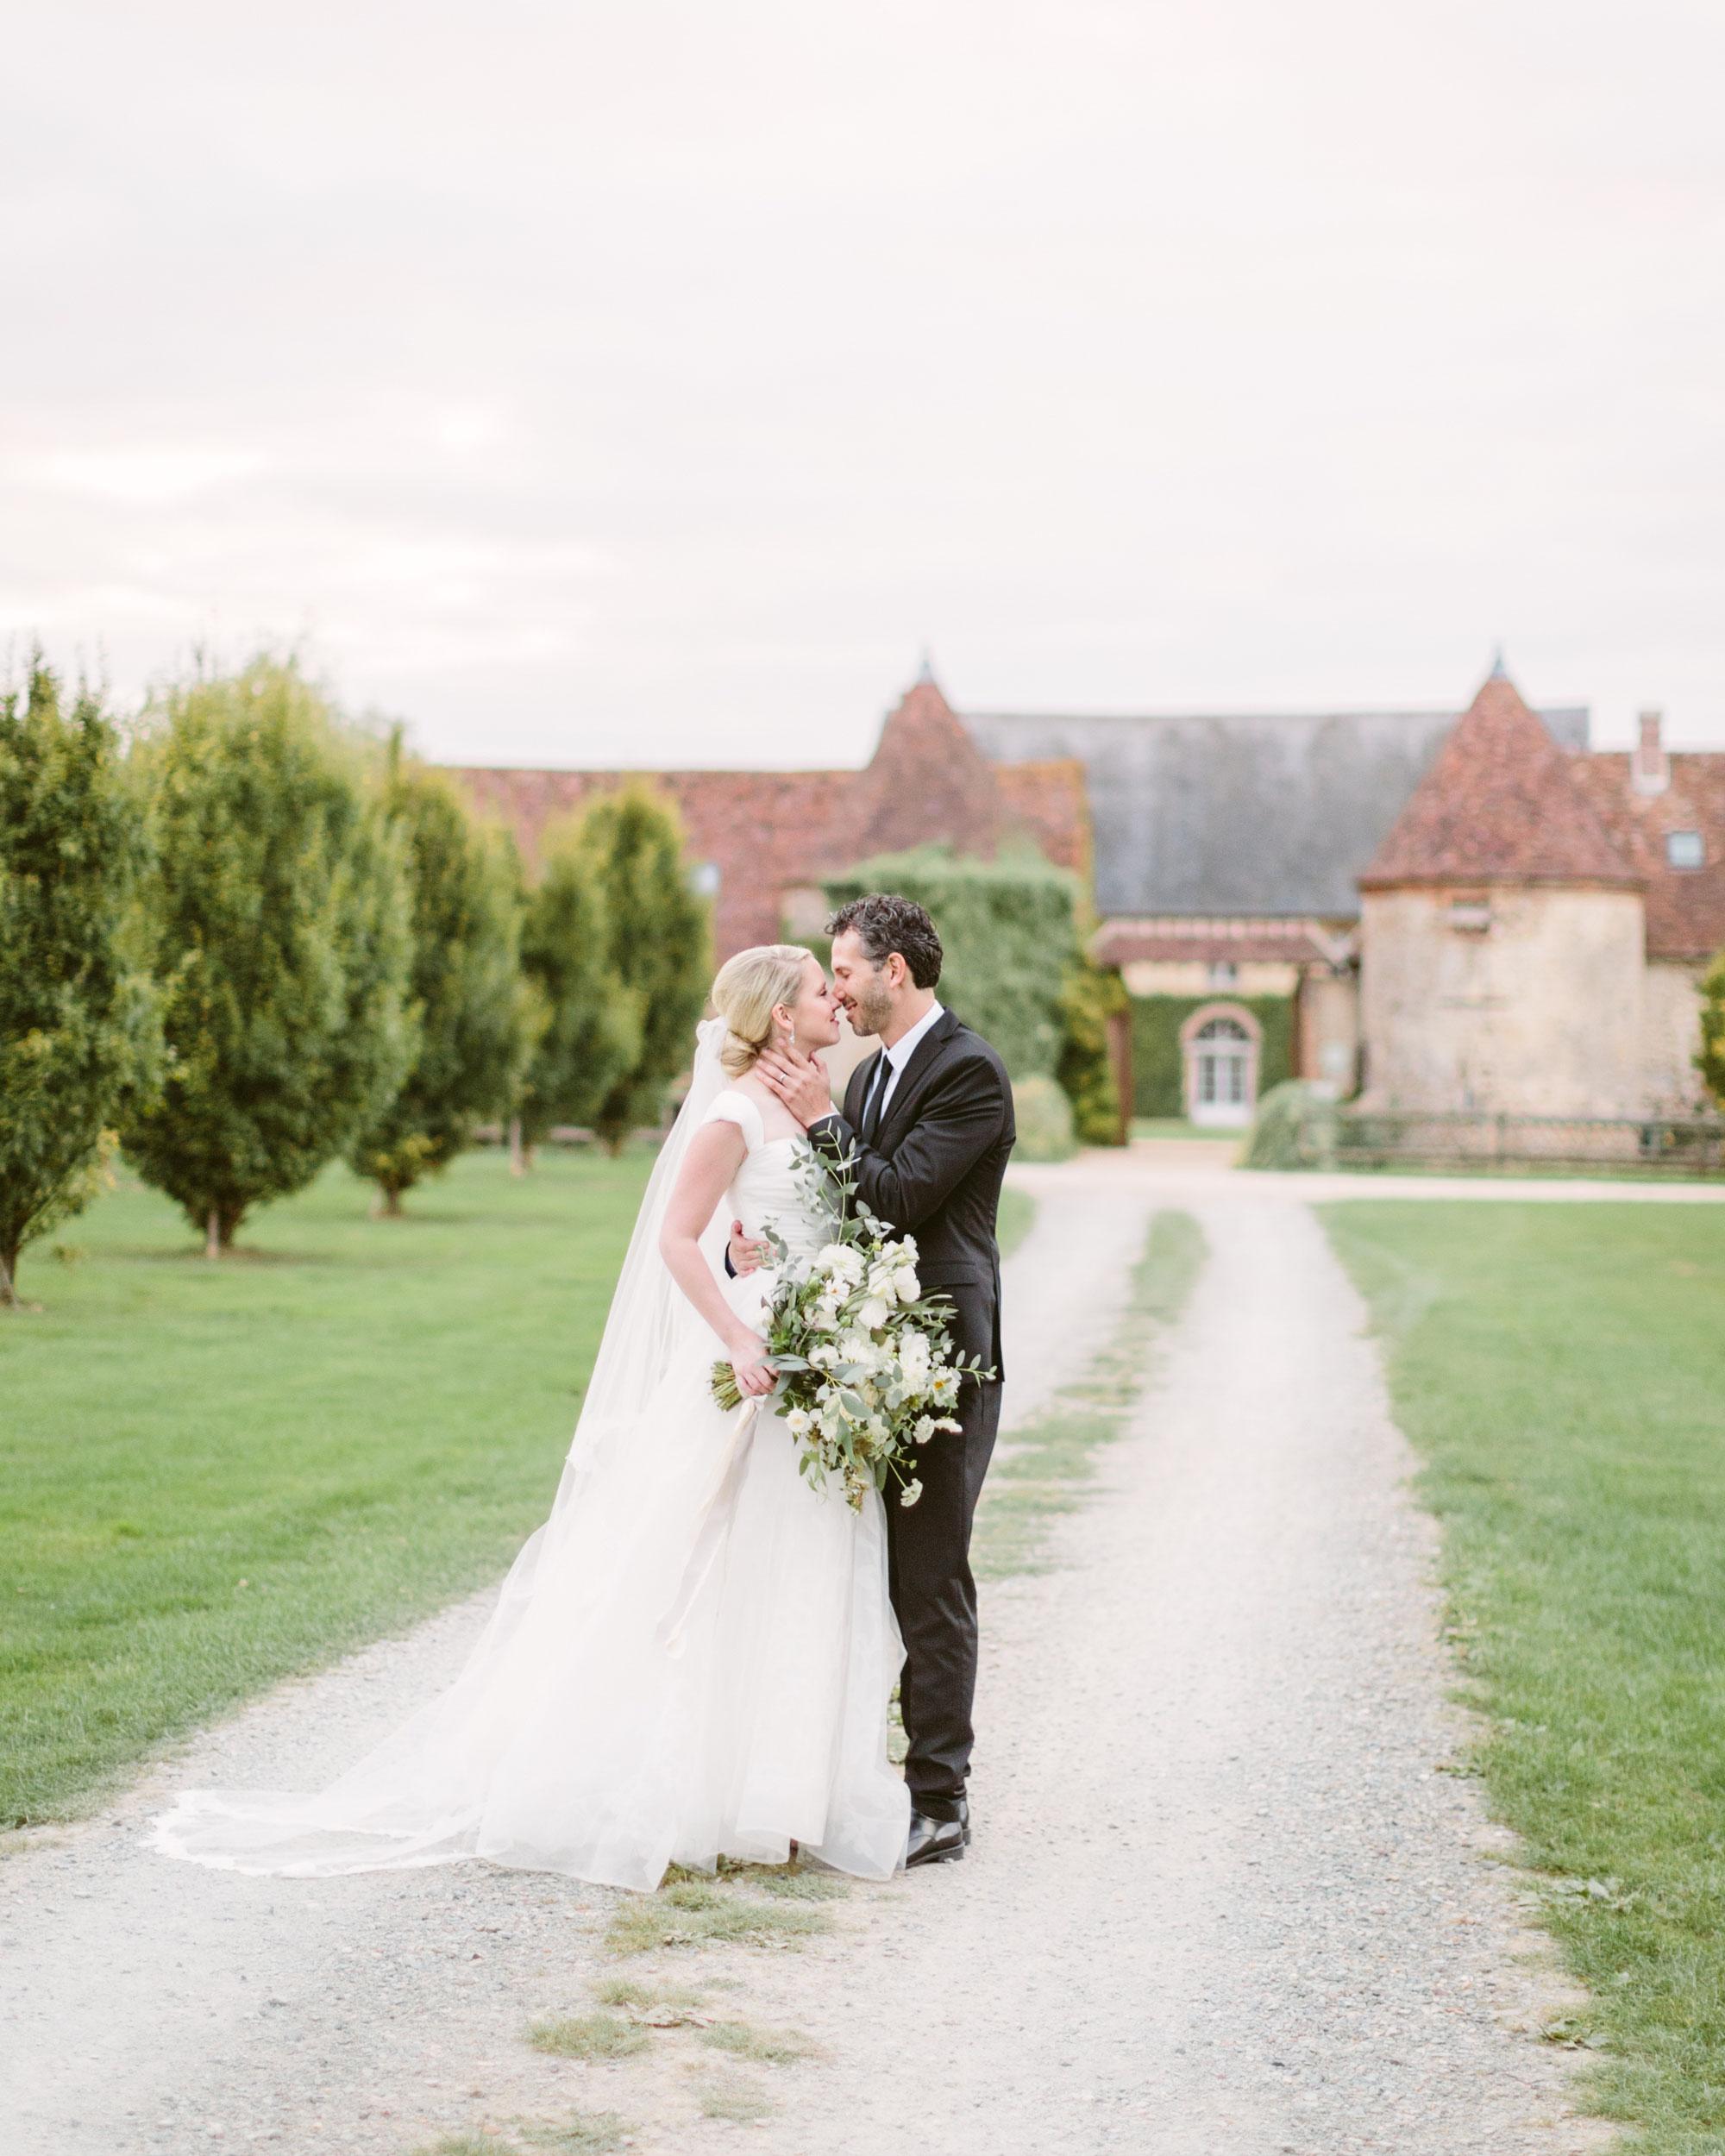 anneclaire-chris-wedding-france-couple-037-s113034-00716.jpg